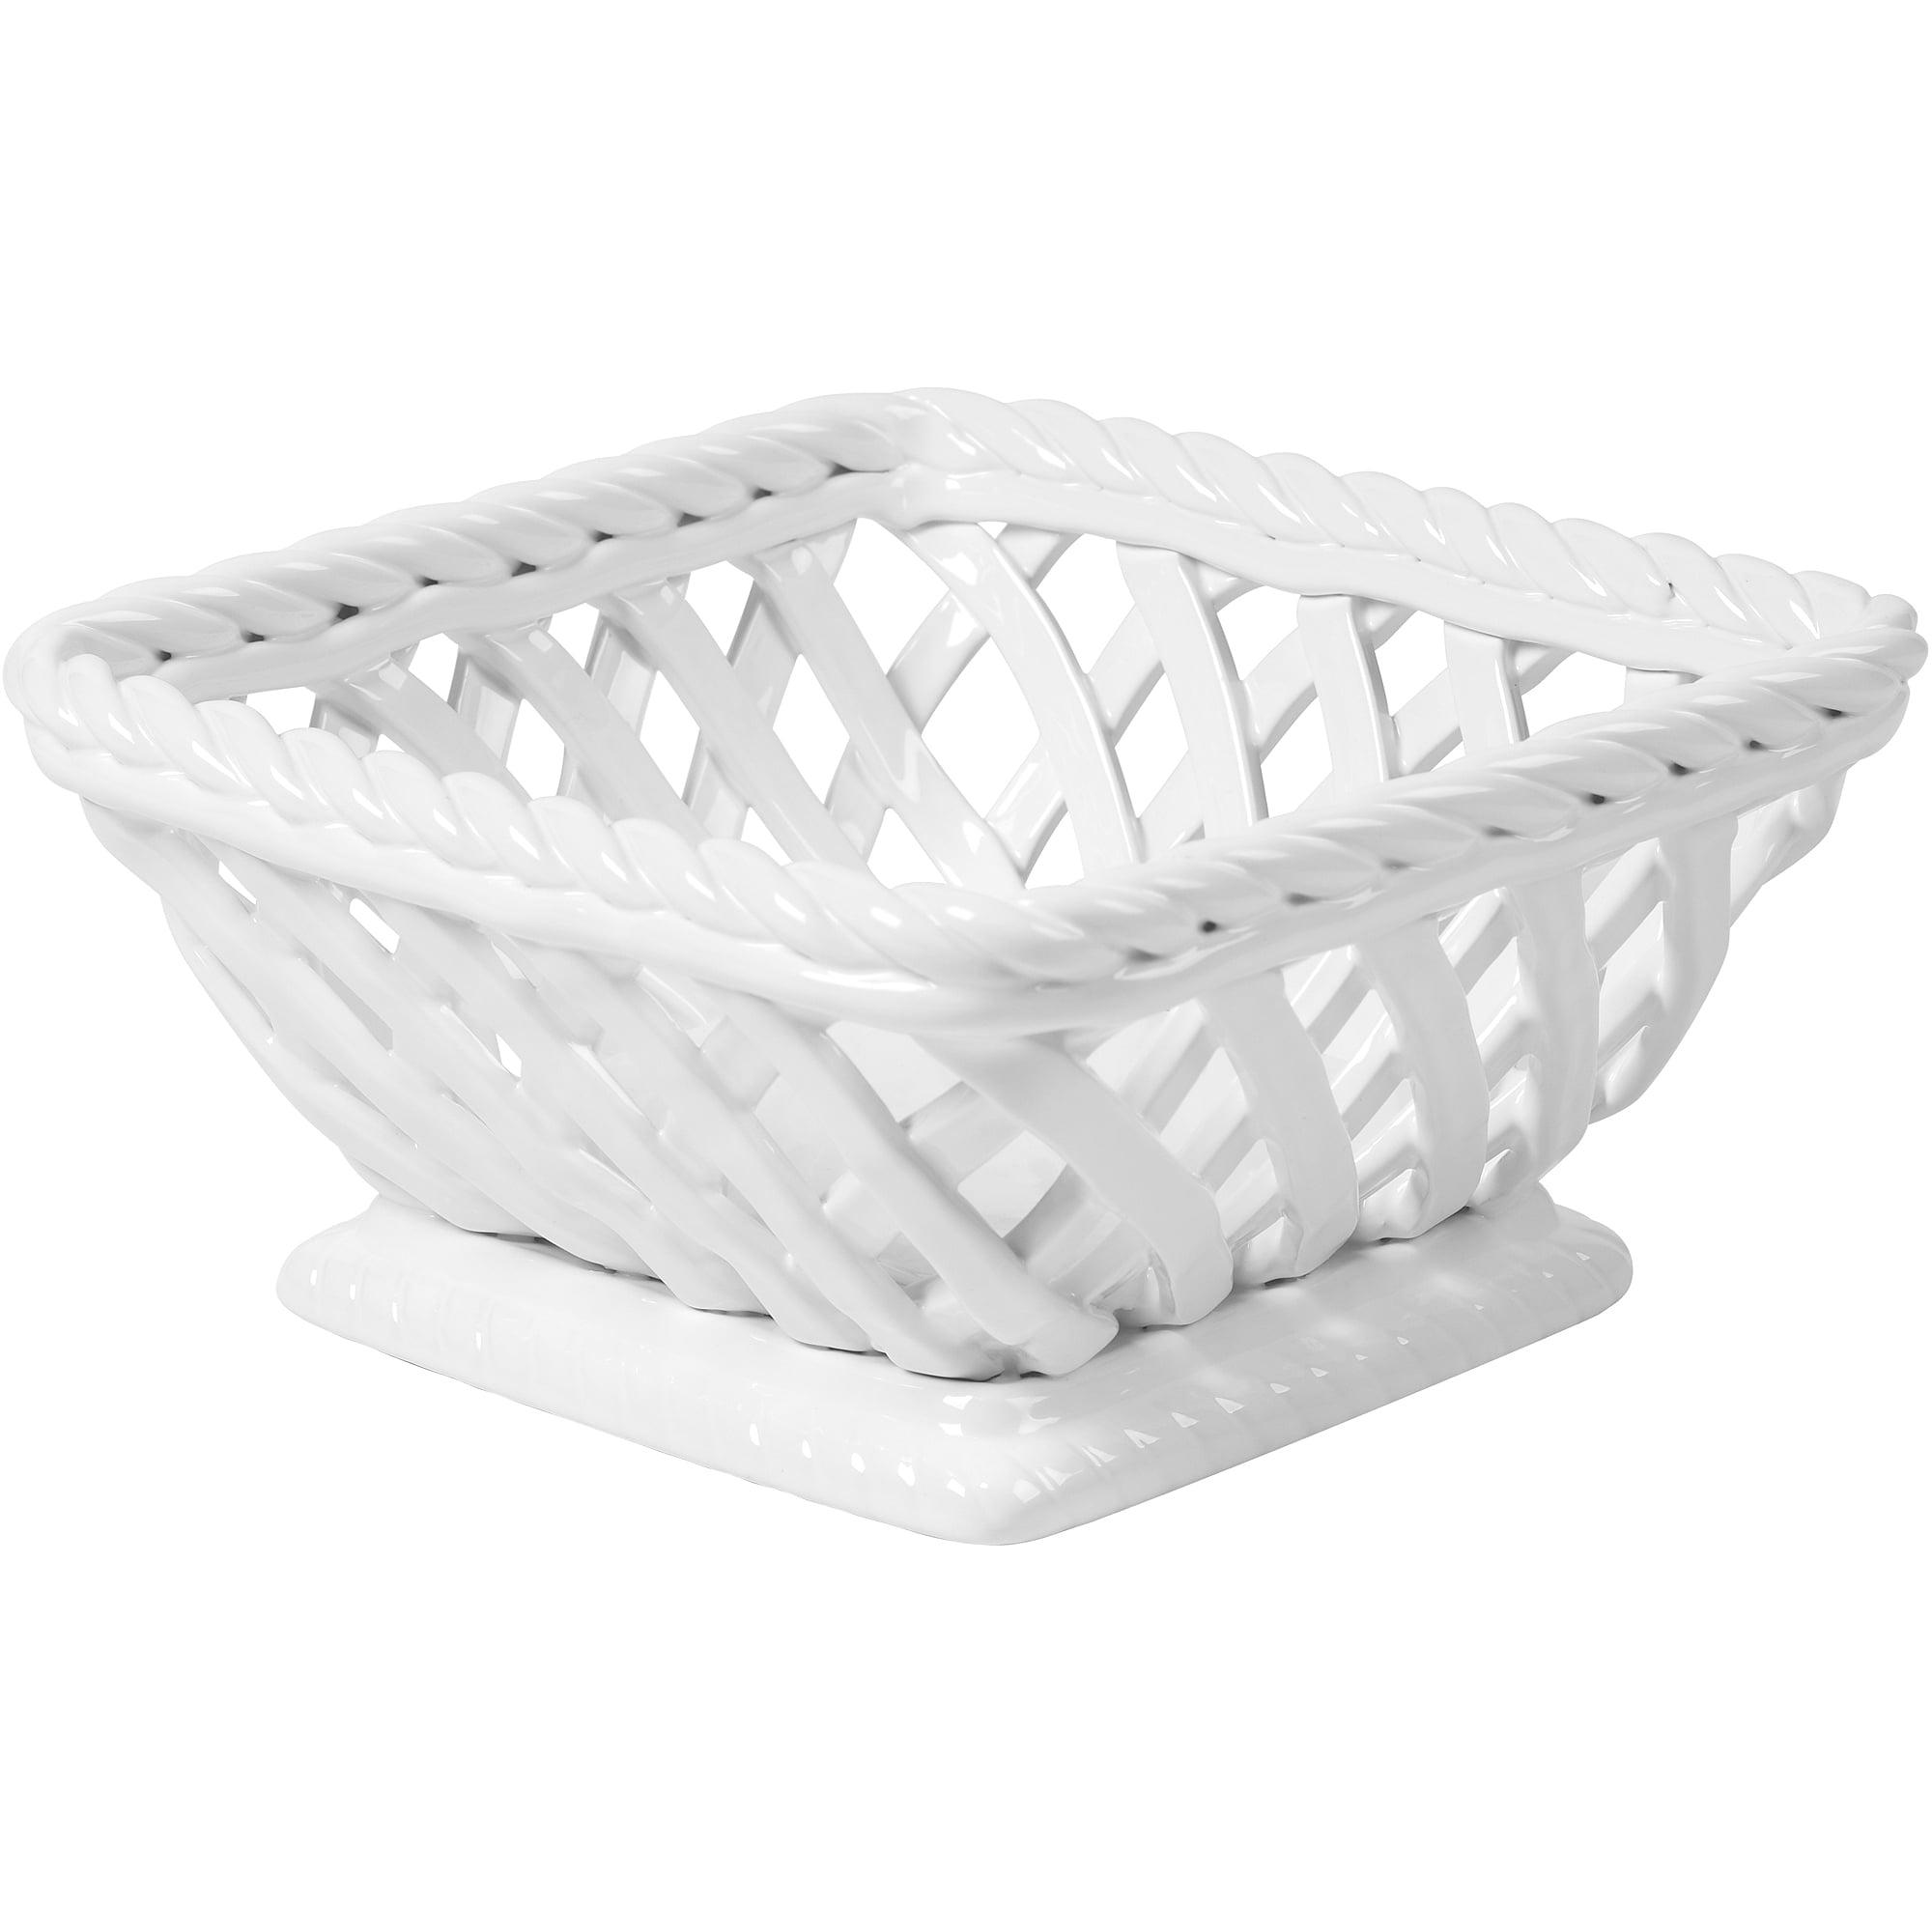 "Mainstays Serving Basket, 9"", White"